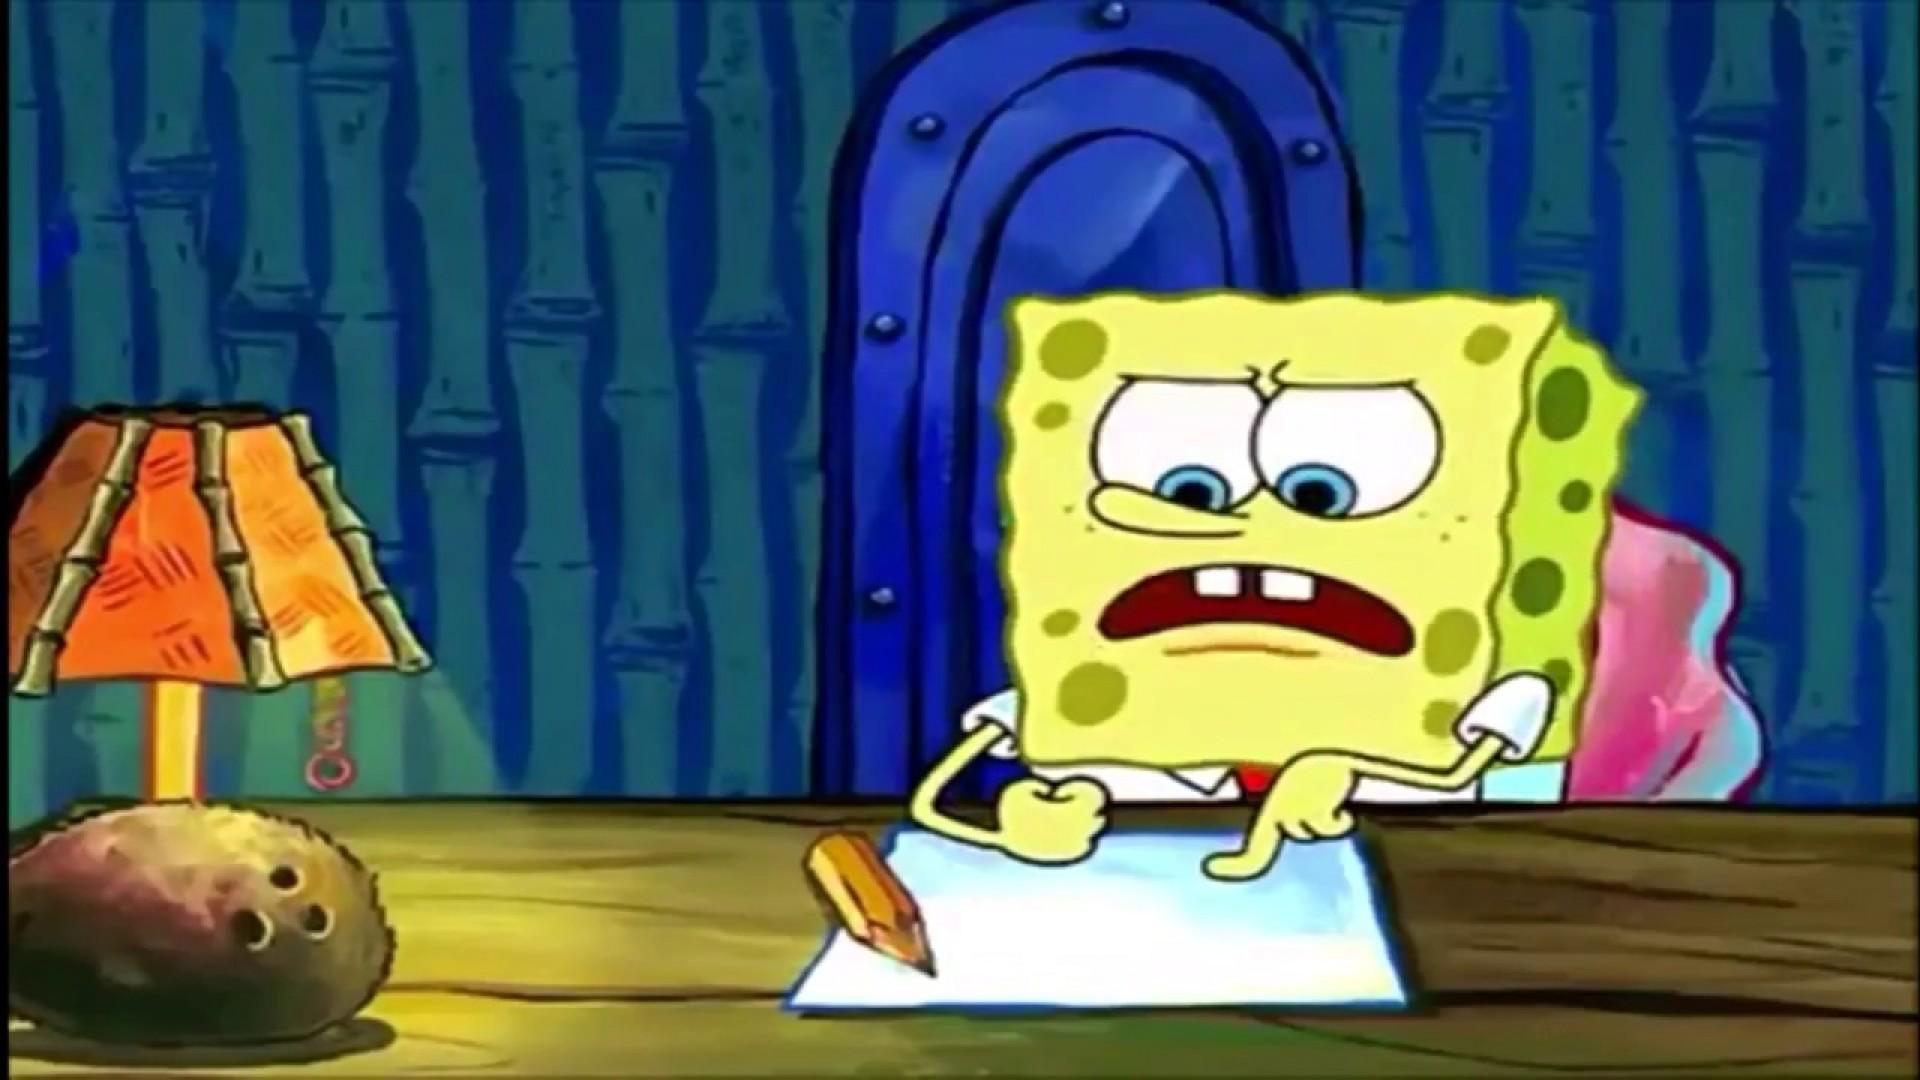 002 Maxresdefault Spongebob Essay Meme Stirring Font Generator 1920